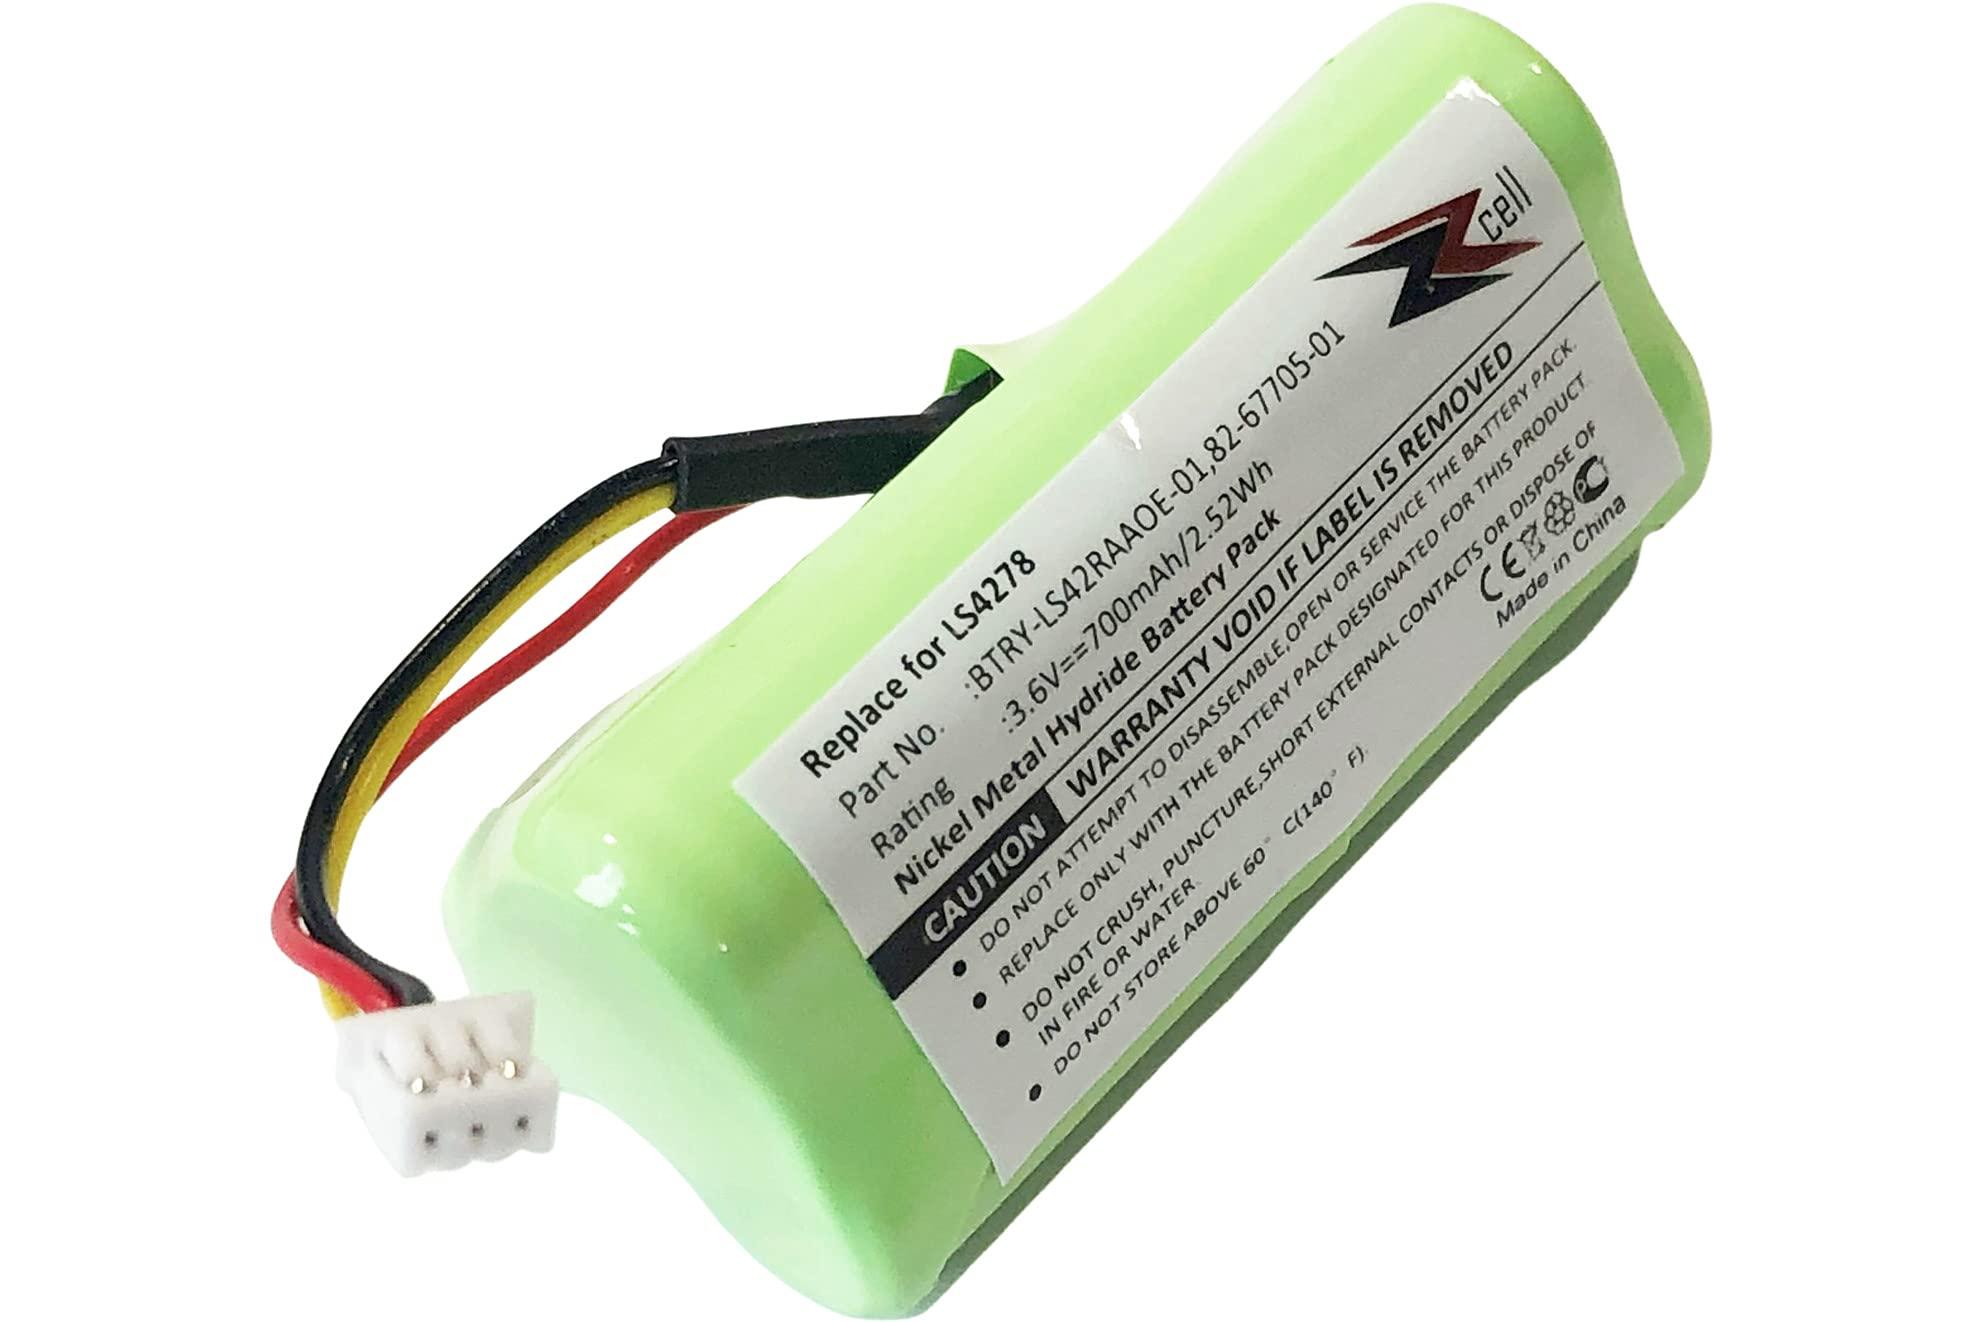 Bateria Para Motorola Symbol LS4278 BTRY-LS42RAAOE-01